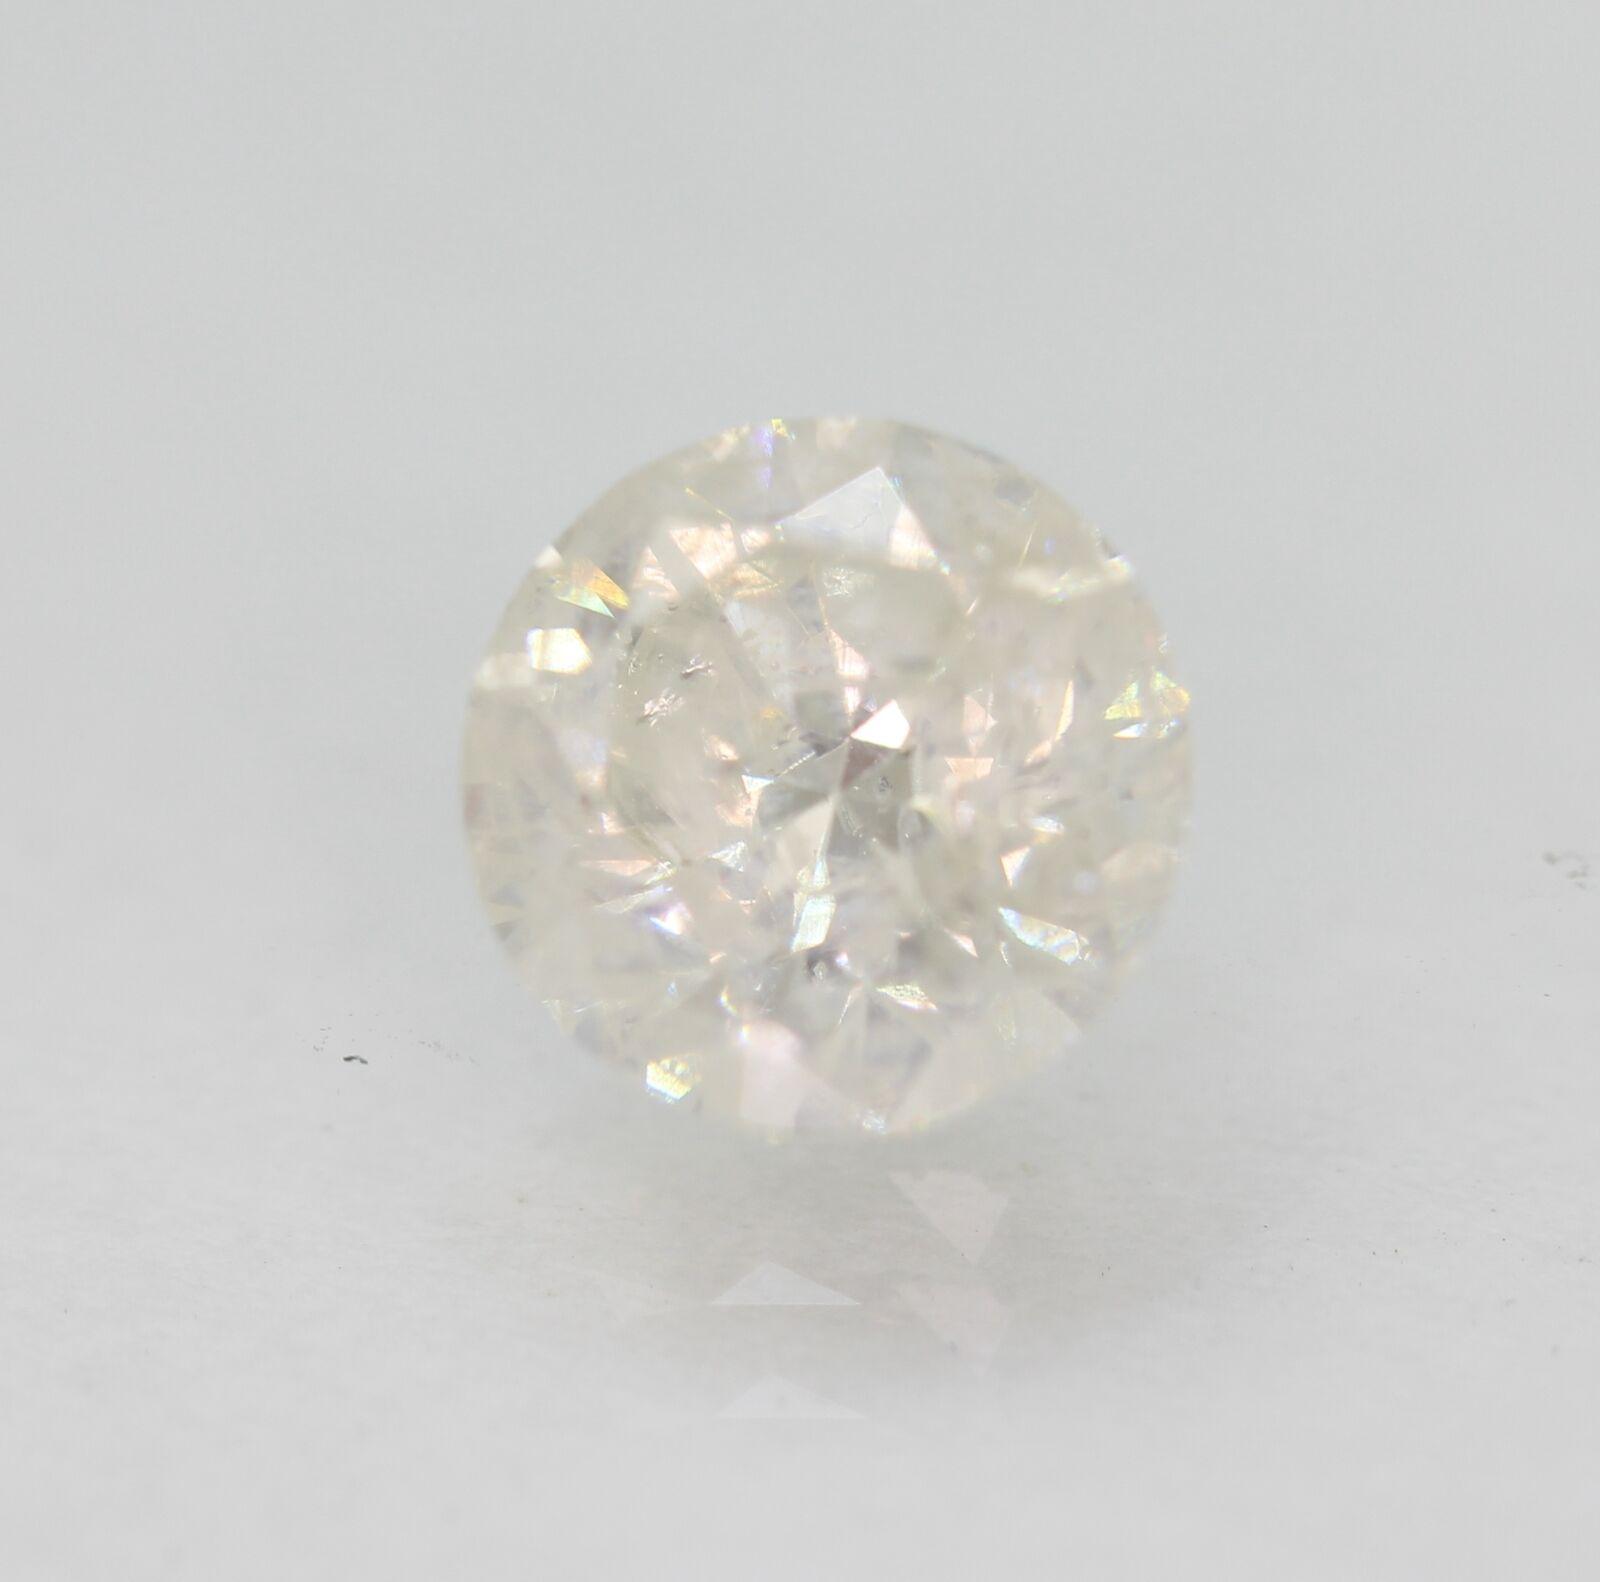 Certified 1.15 Carat H SI3 Round Brilliant Natural Loose Diamond 6.49mm #310